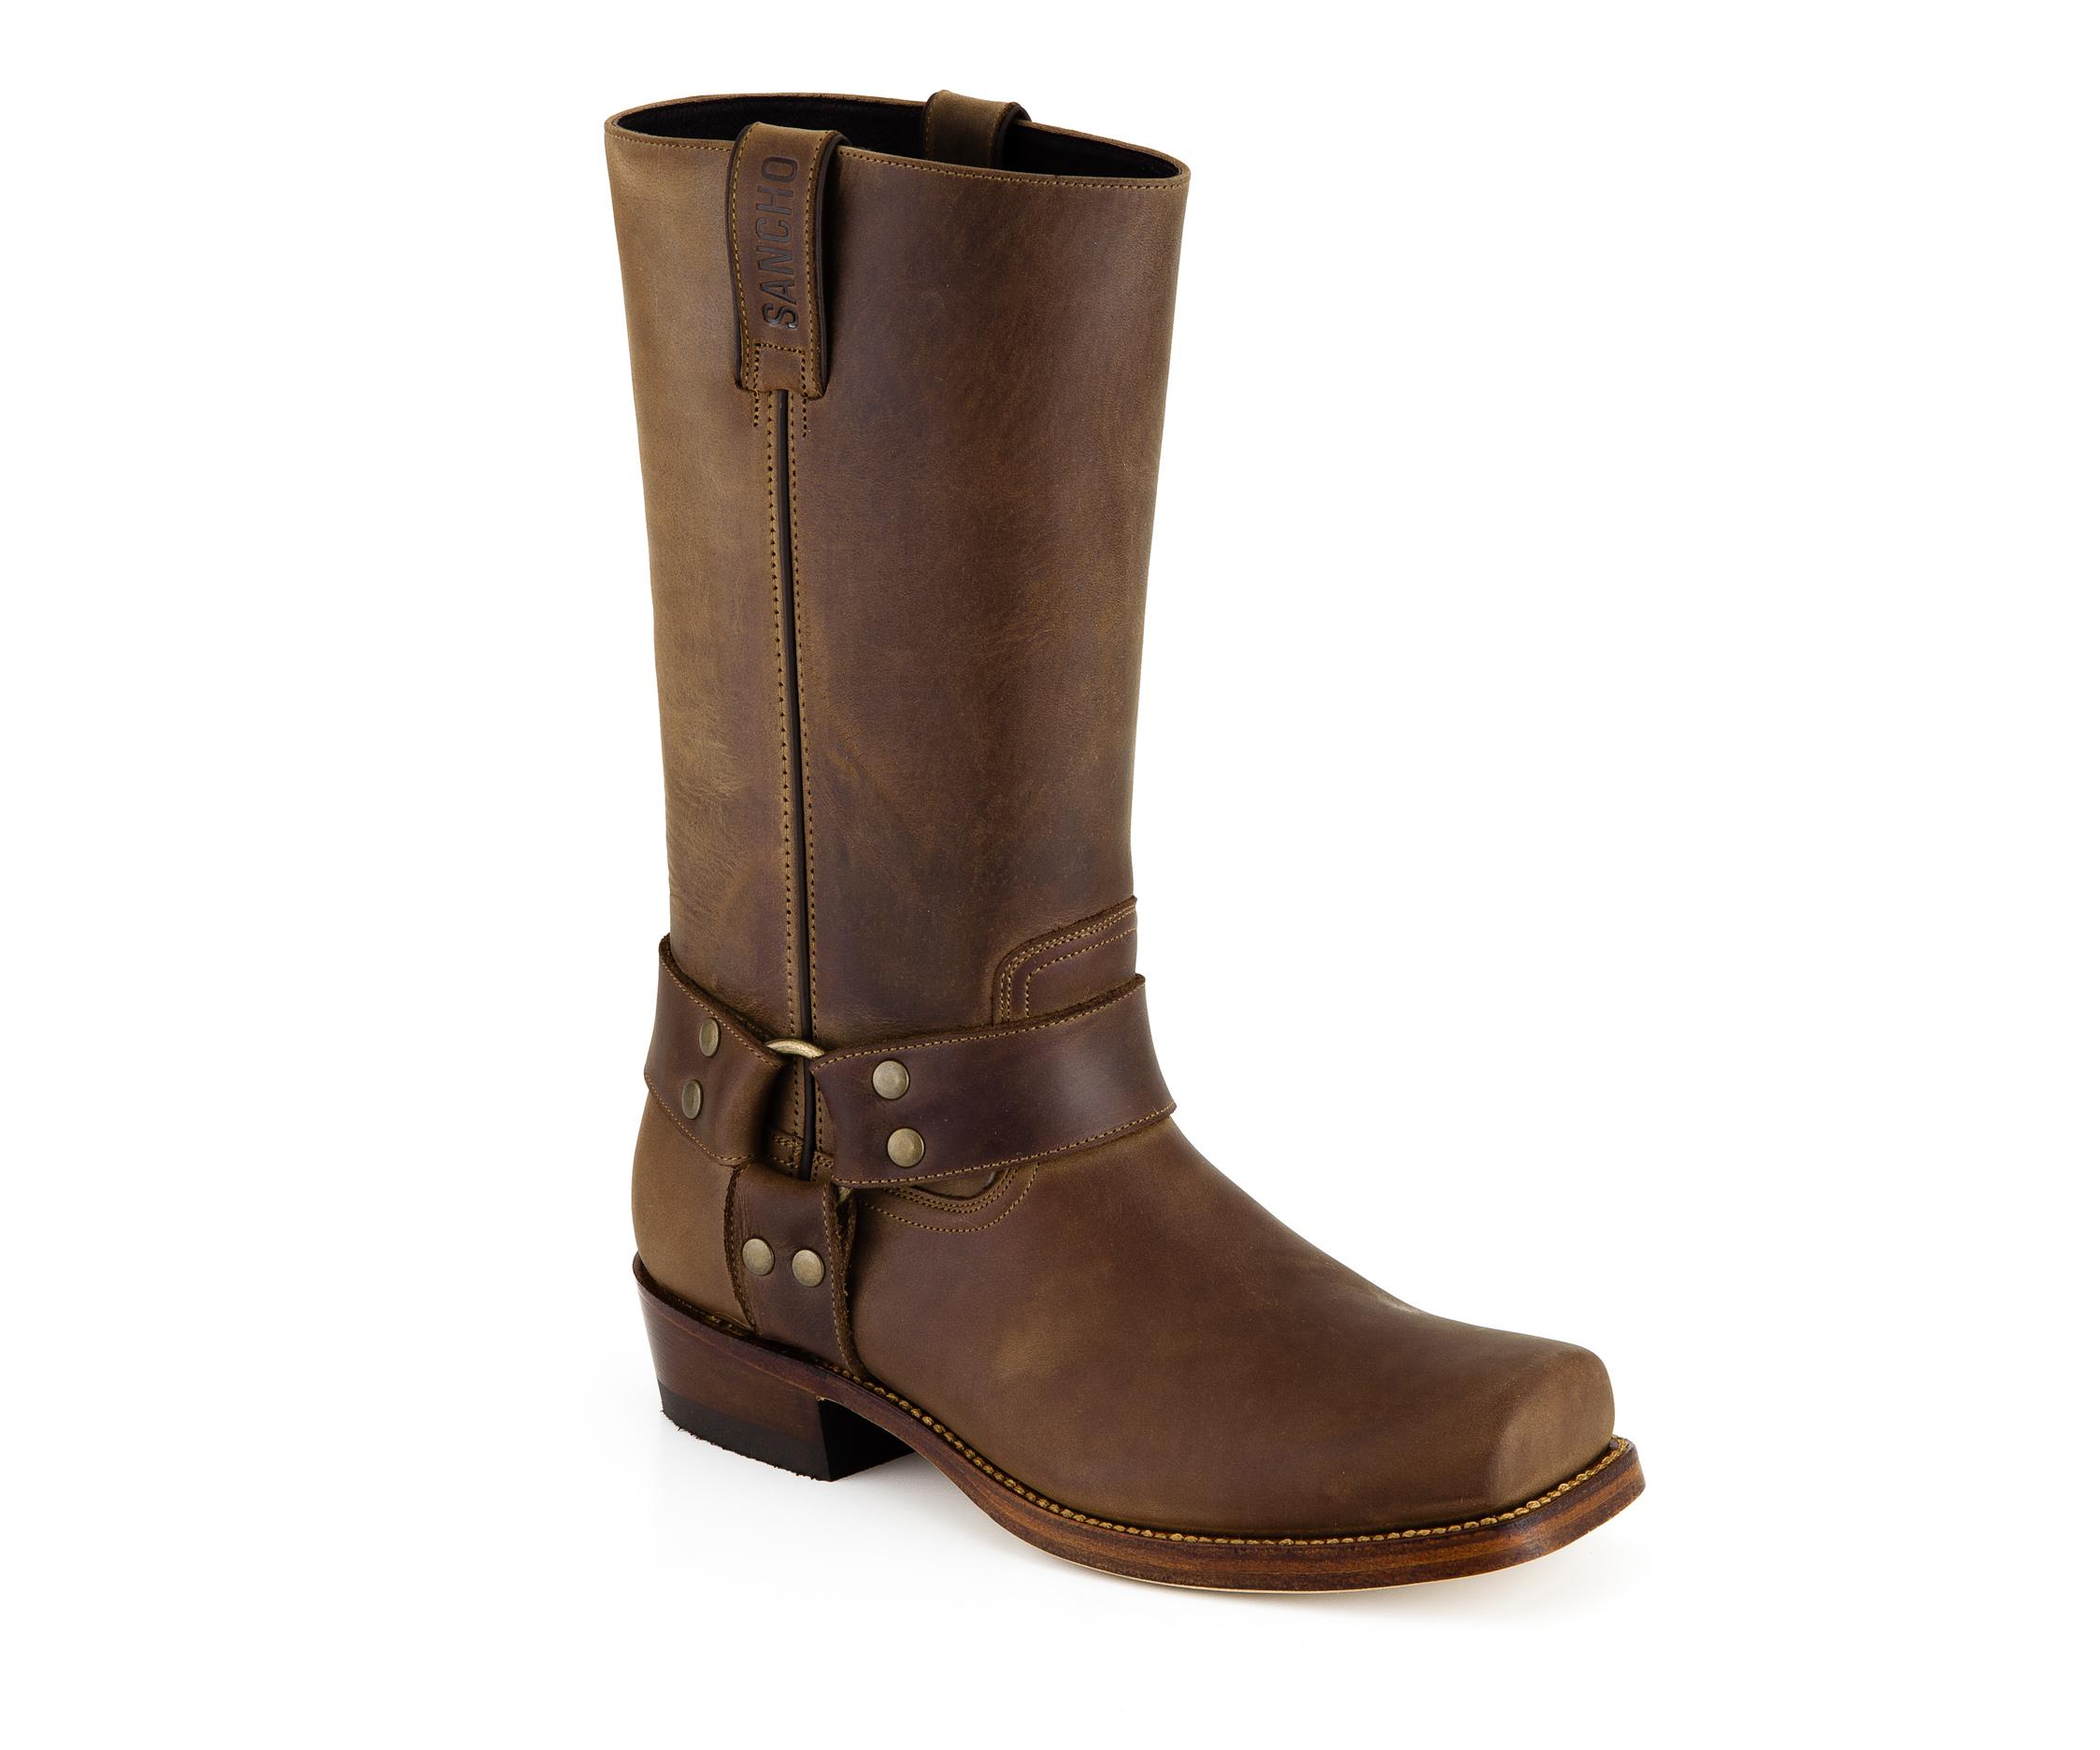 Bottes cuir vachette marron Sancho Abarca Boots Farmer 541 71